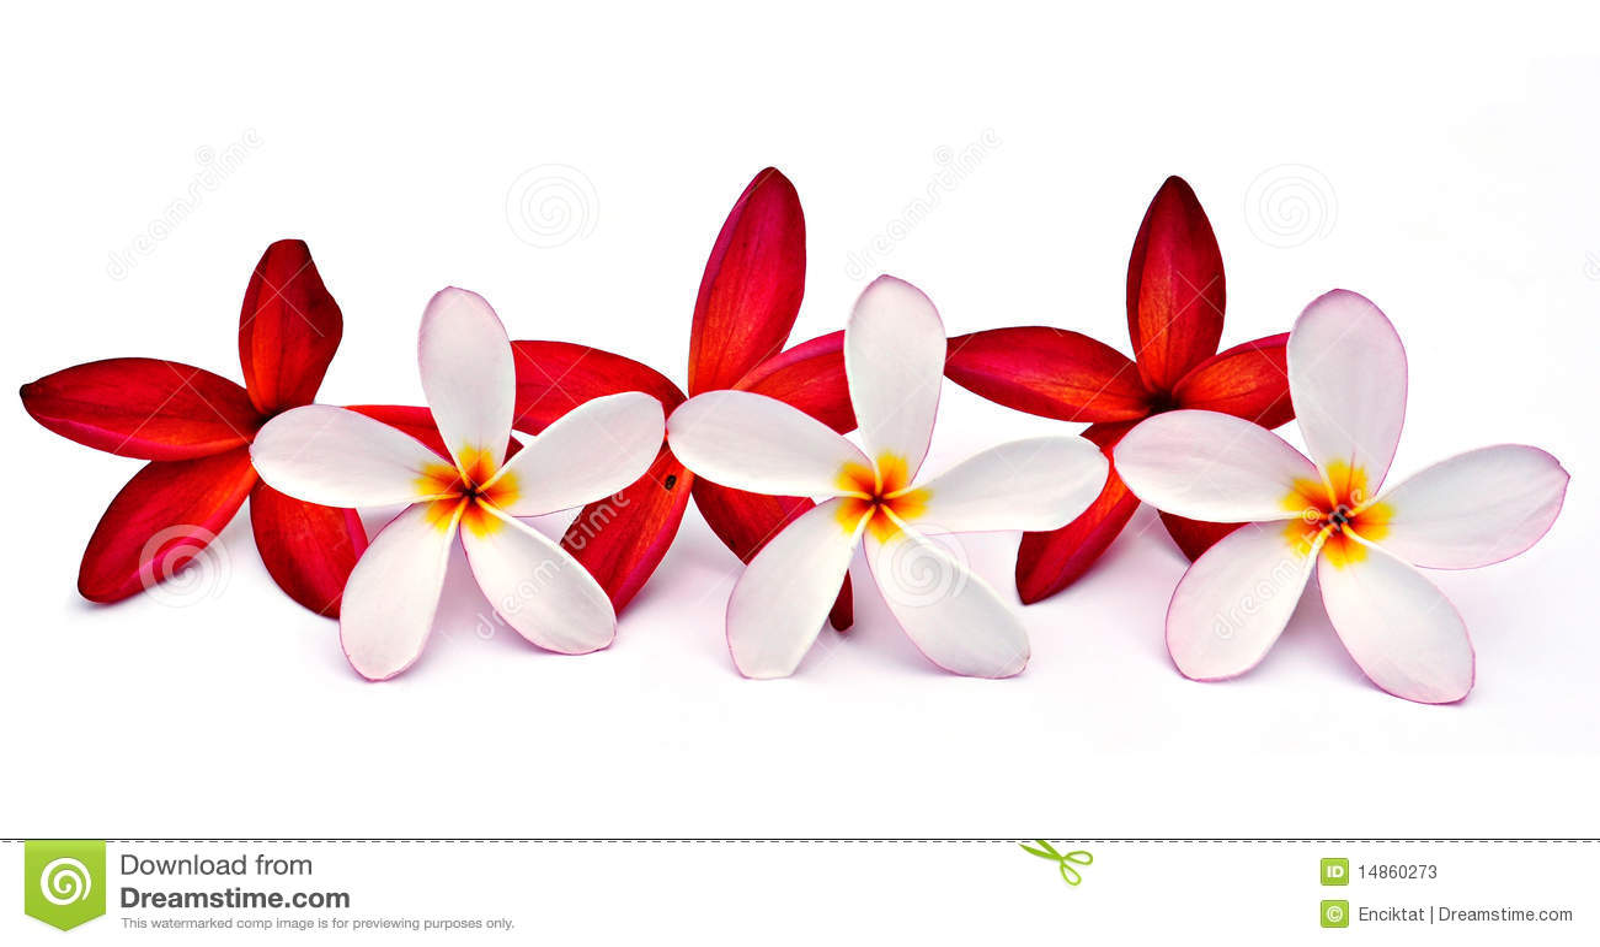 Red and white Plumeria